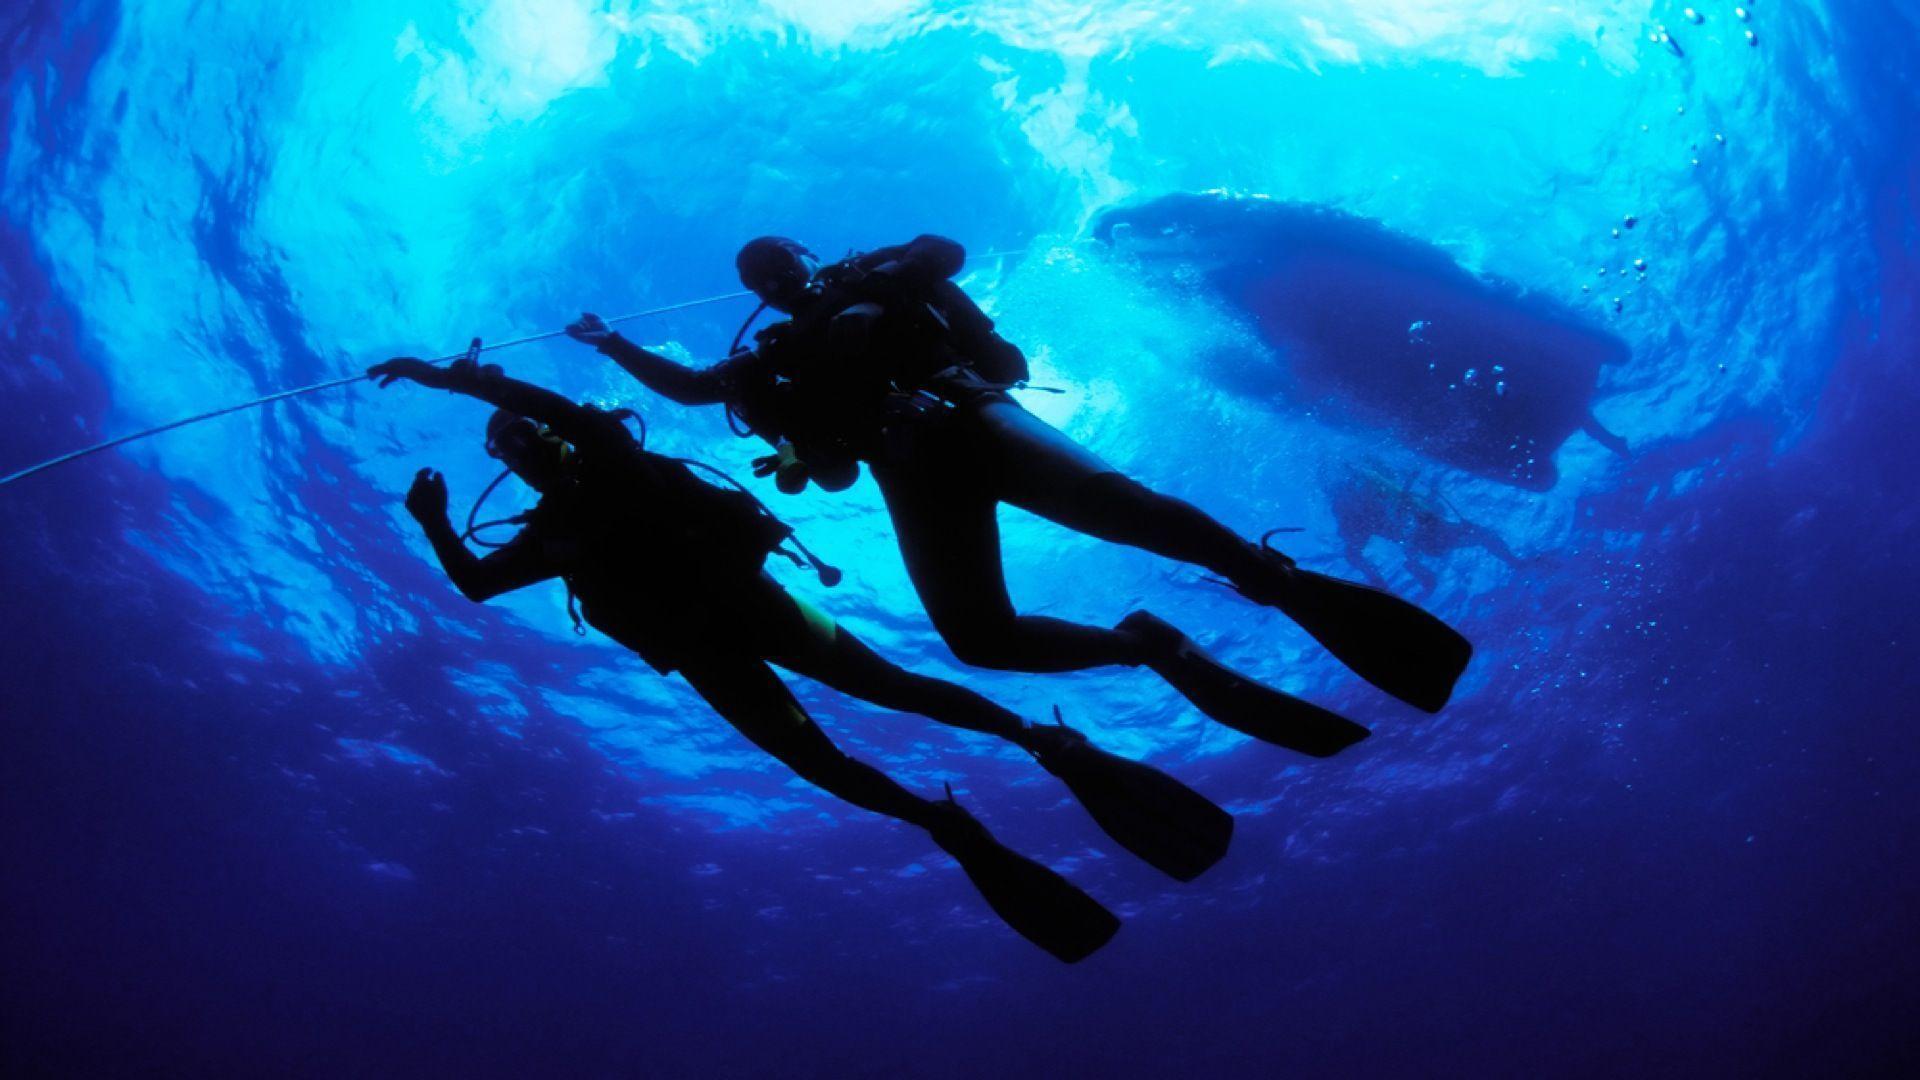 scuba diving wallpaper wallpapers - photo #8